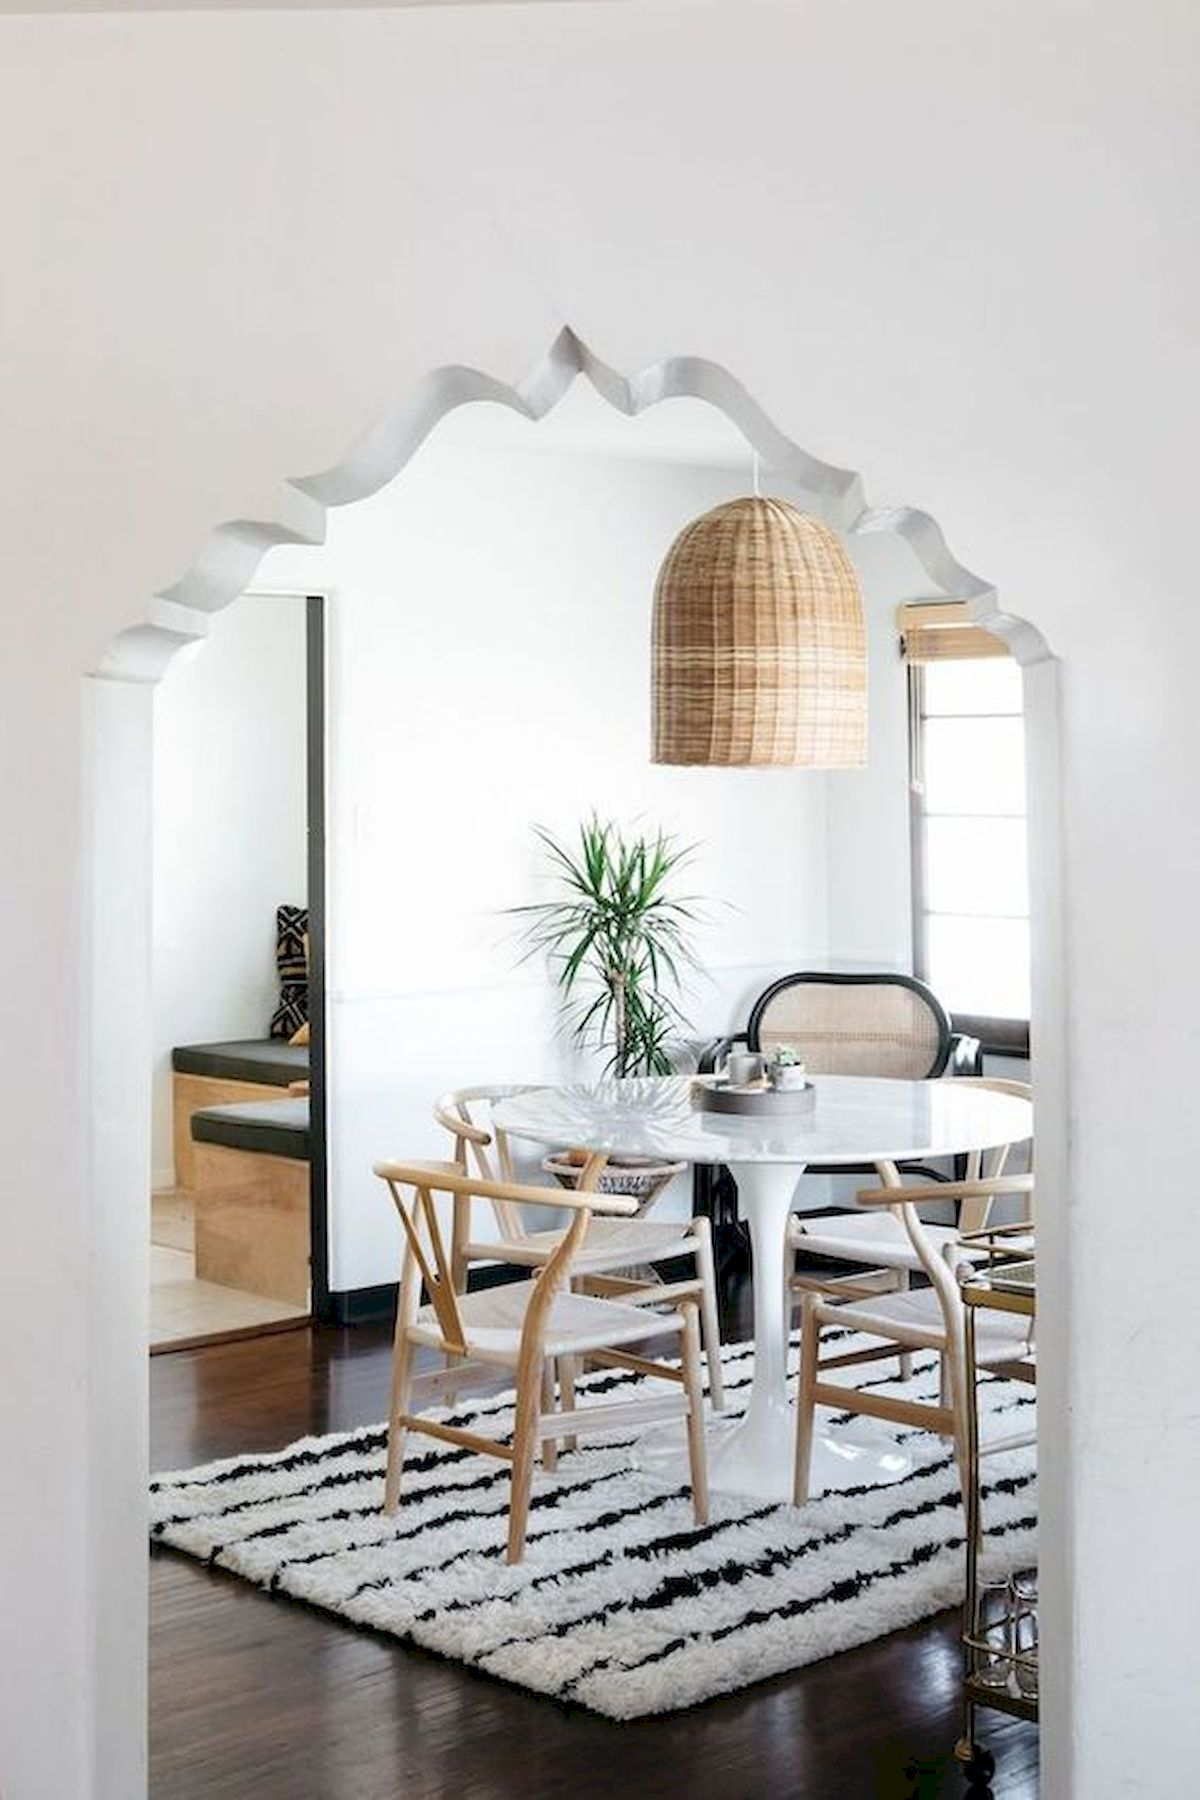 35 Stunning Scandinavian Interior Design and Decor Ideas (20)